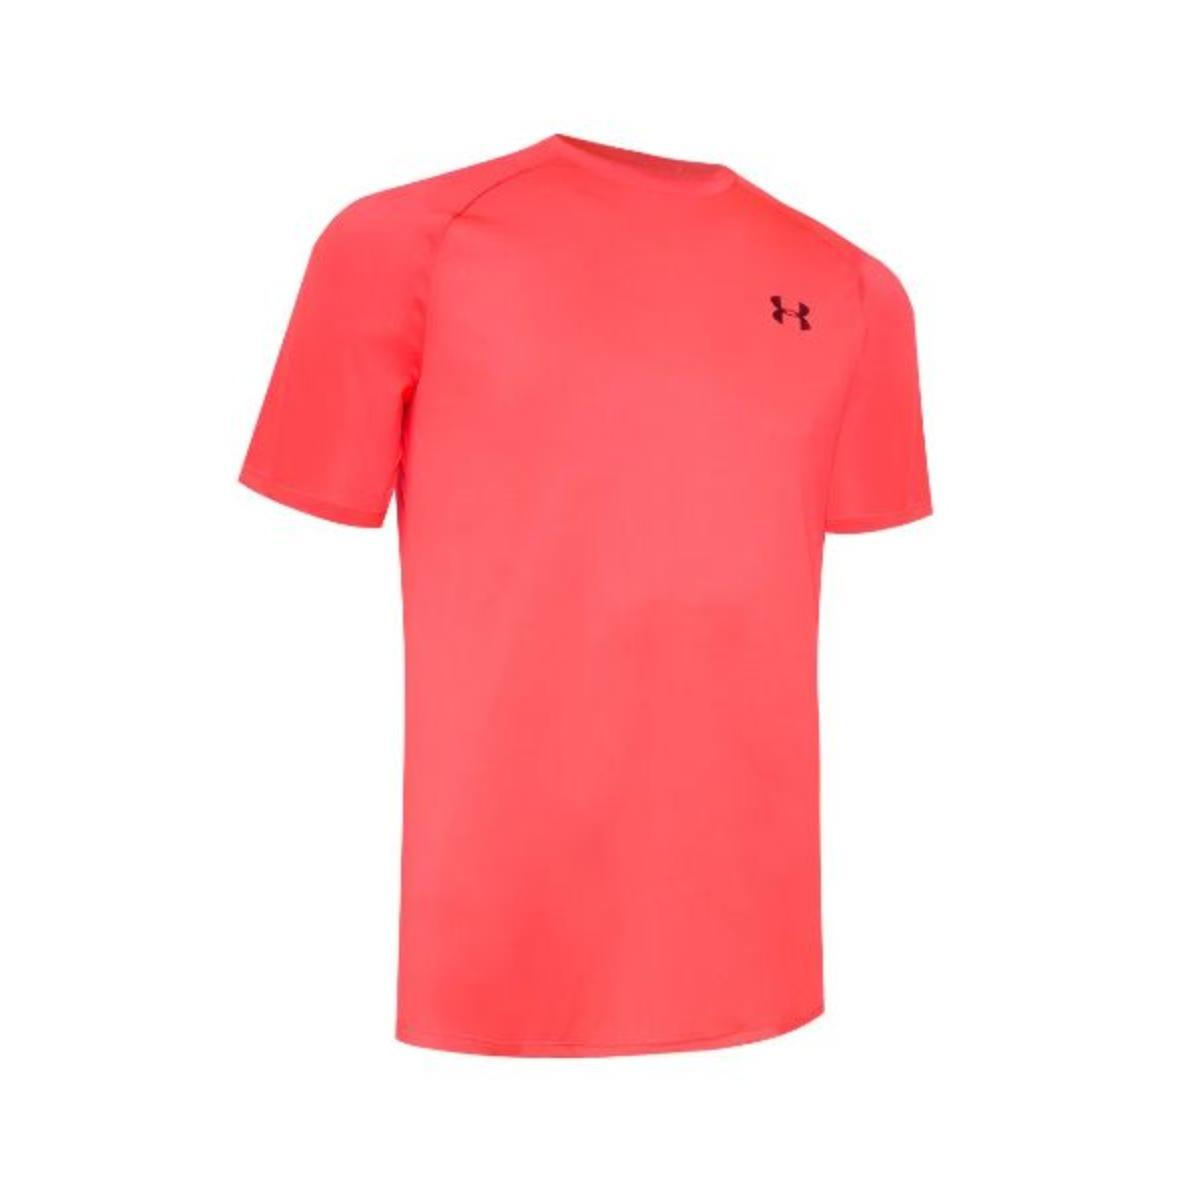 Camiseta Masculina Under Armour 1359378  Tech 2.0 Laranja Neon